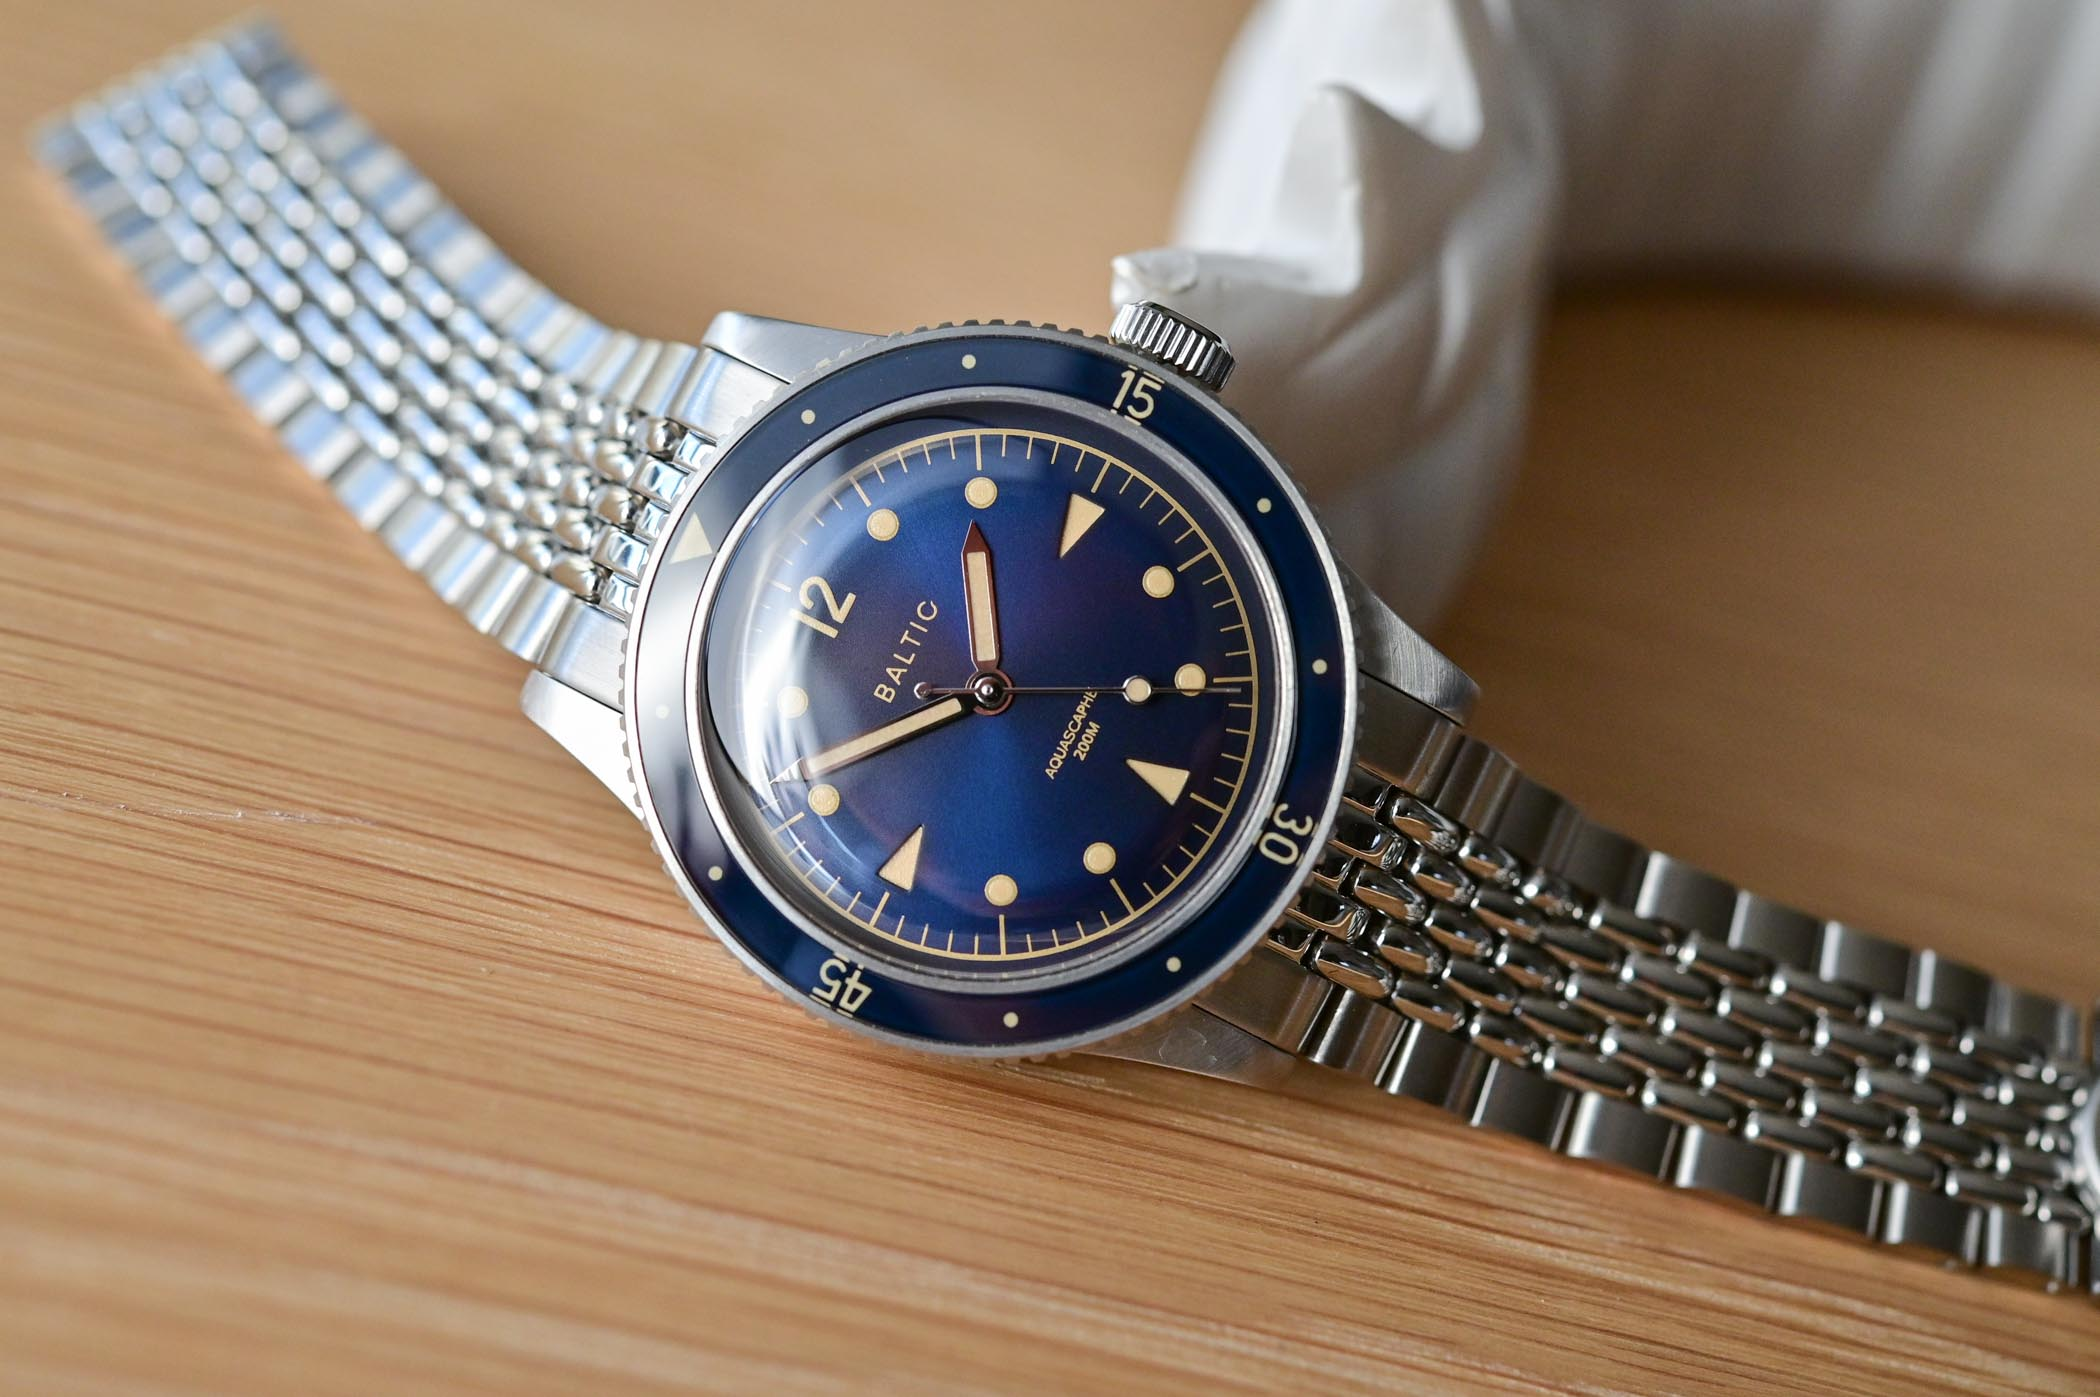 Baltic Aquascaphe Dive Watch - Review